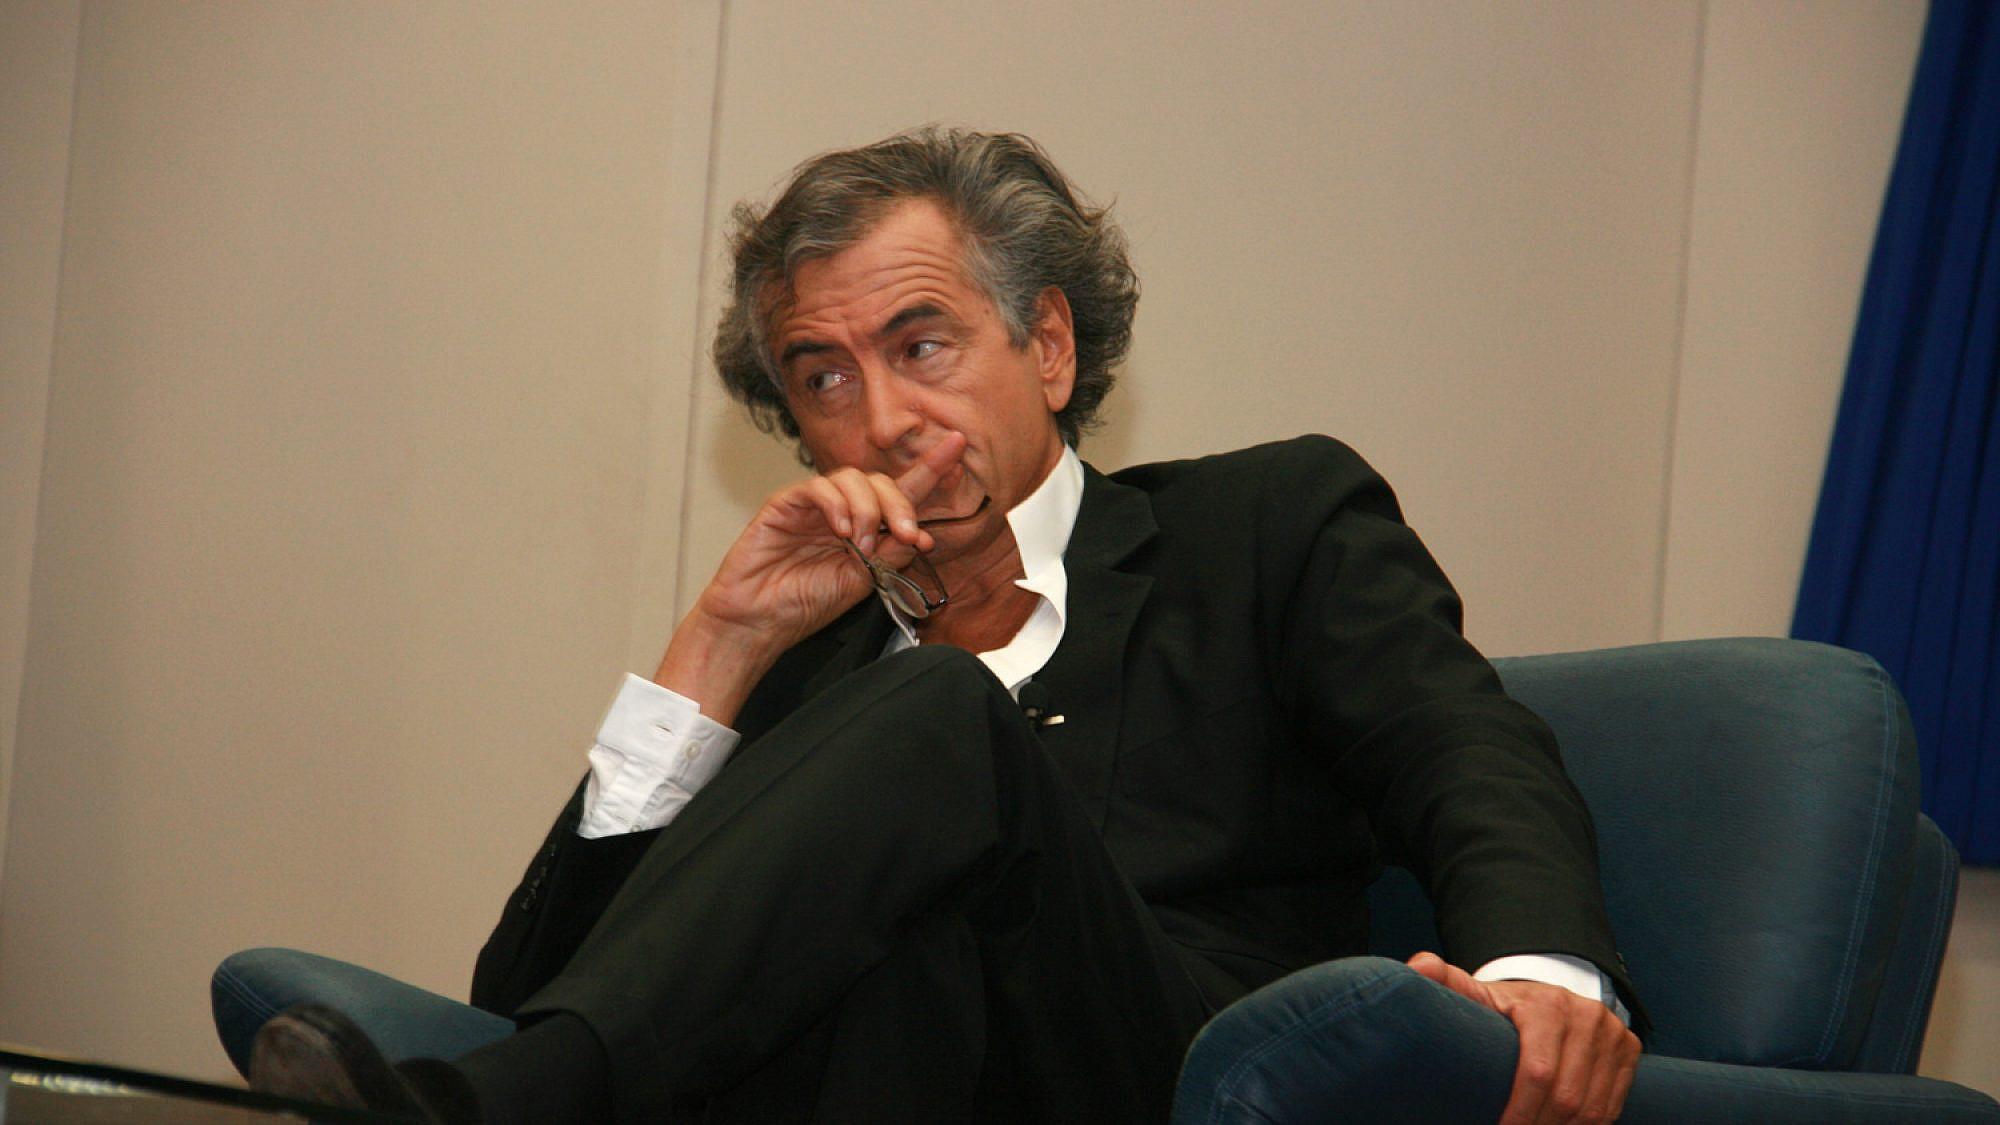 Bernard-Henri Lévy at Tel Aviv University. Credit: Itzike/Wikimedia Commons.